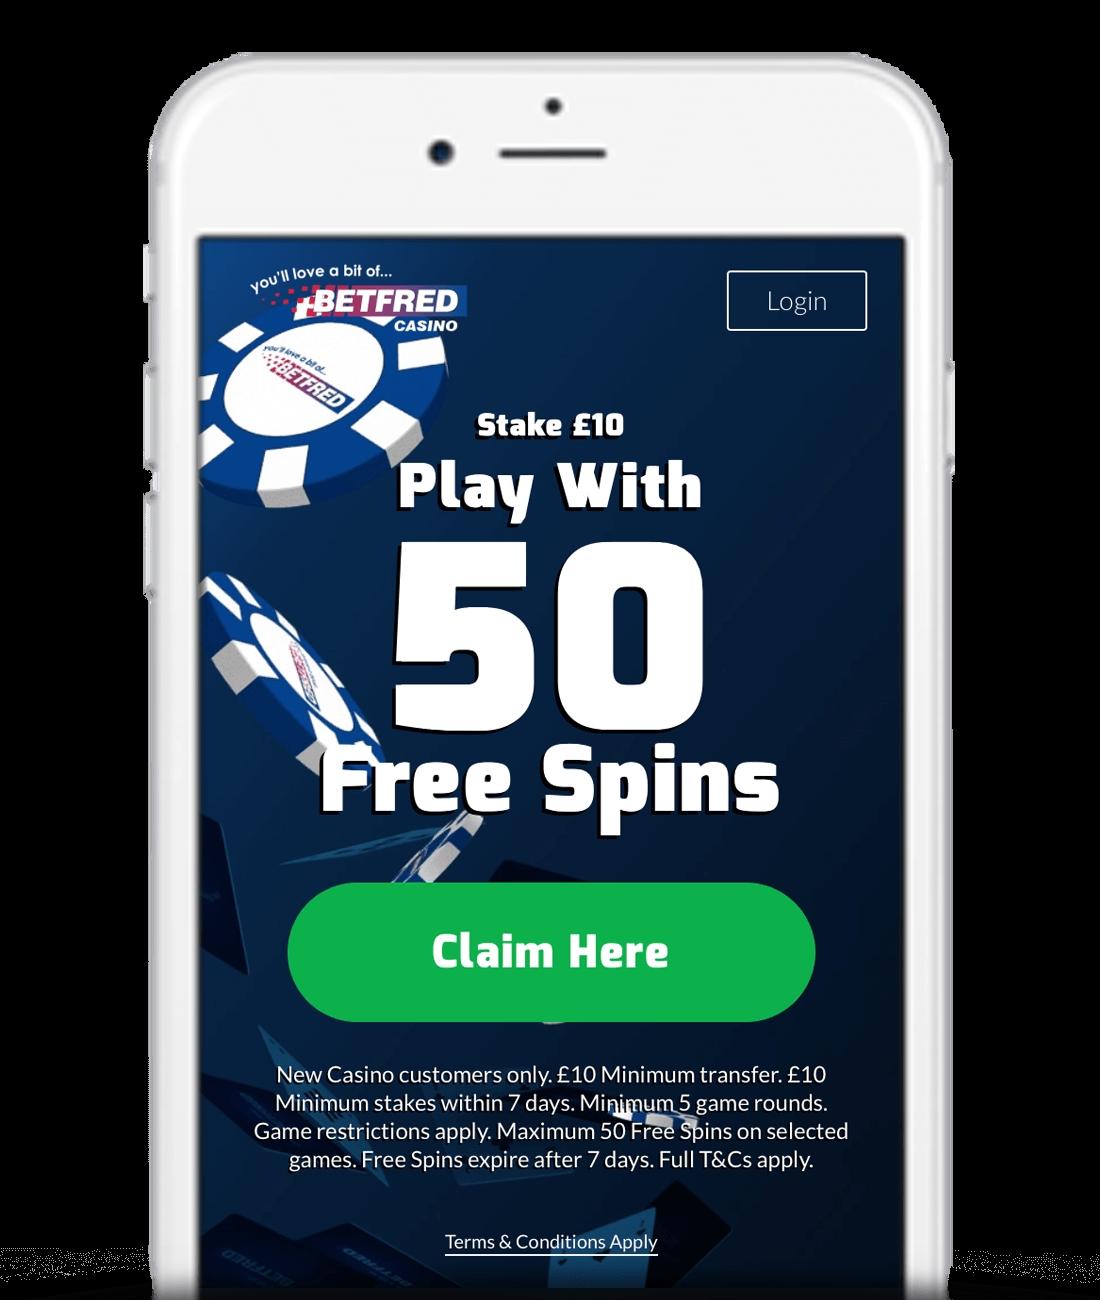 $515 Daily freeroll slot tournament at Casino.com